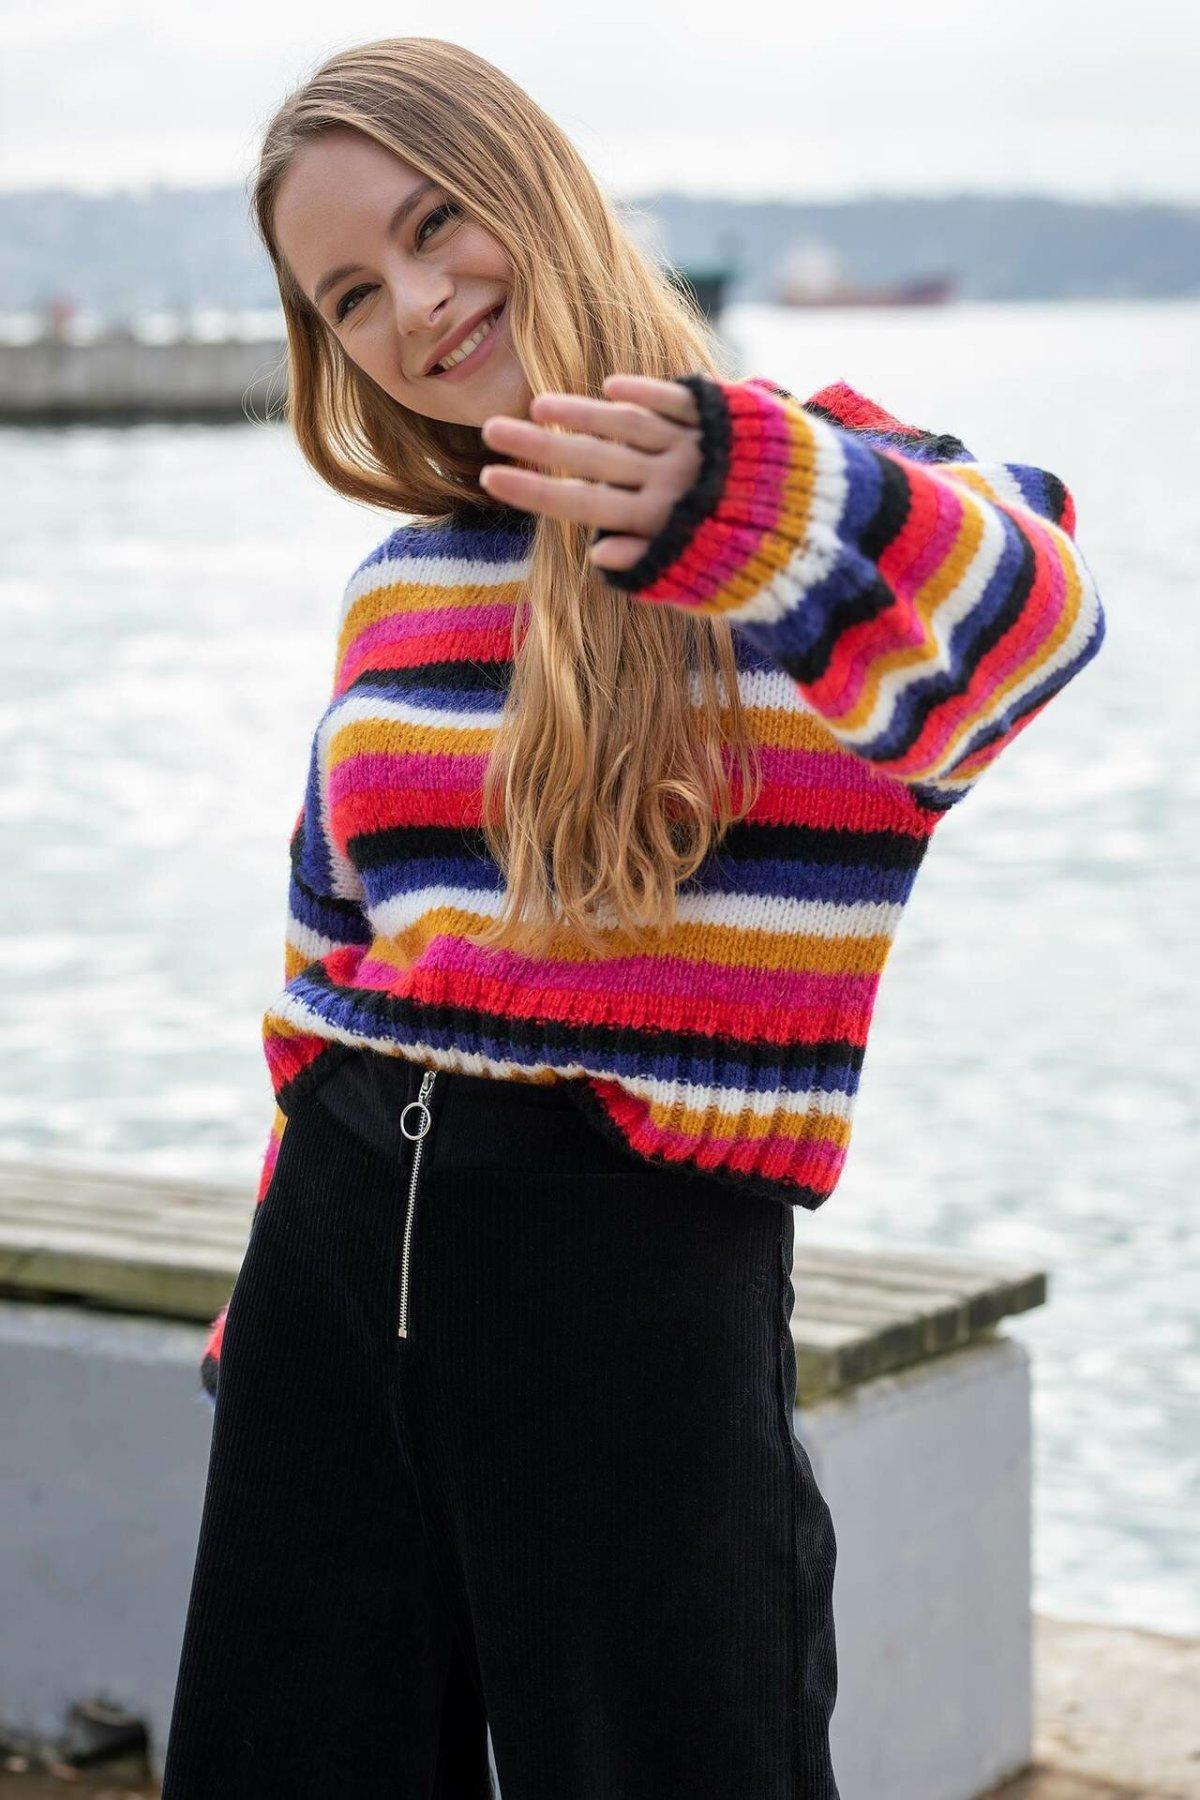 DeFacto Women Harajuku Striped O-neck Pullovers Simple Colorful Knitted Sweatshirts Comfort Sweatshirts Female New-I7510AZ18A